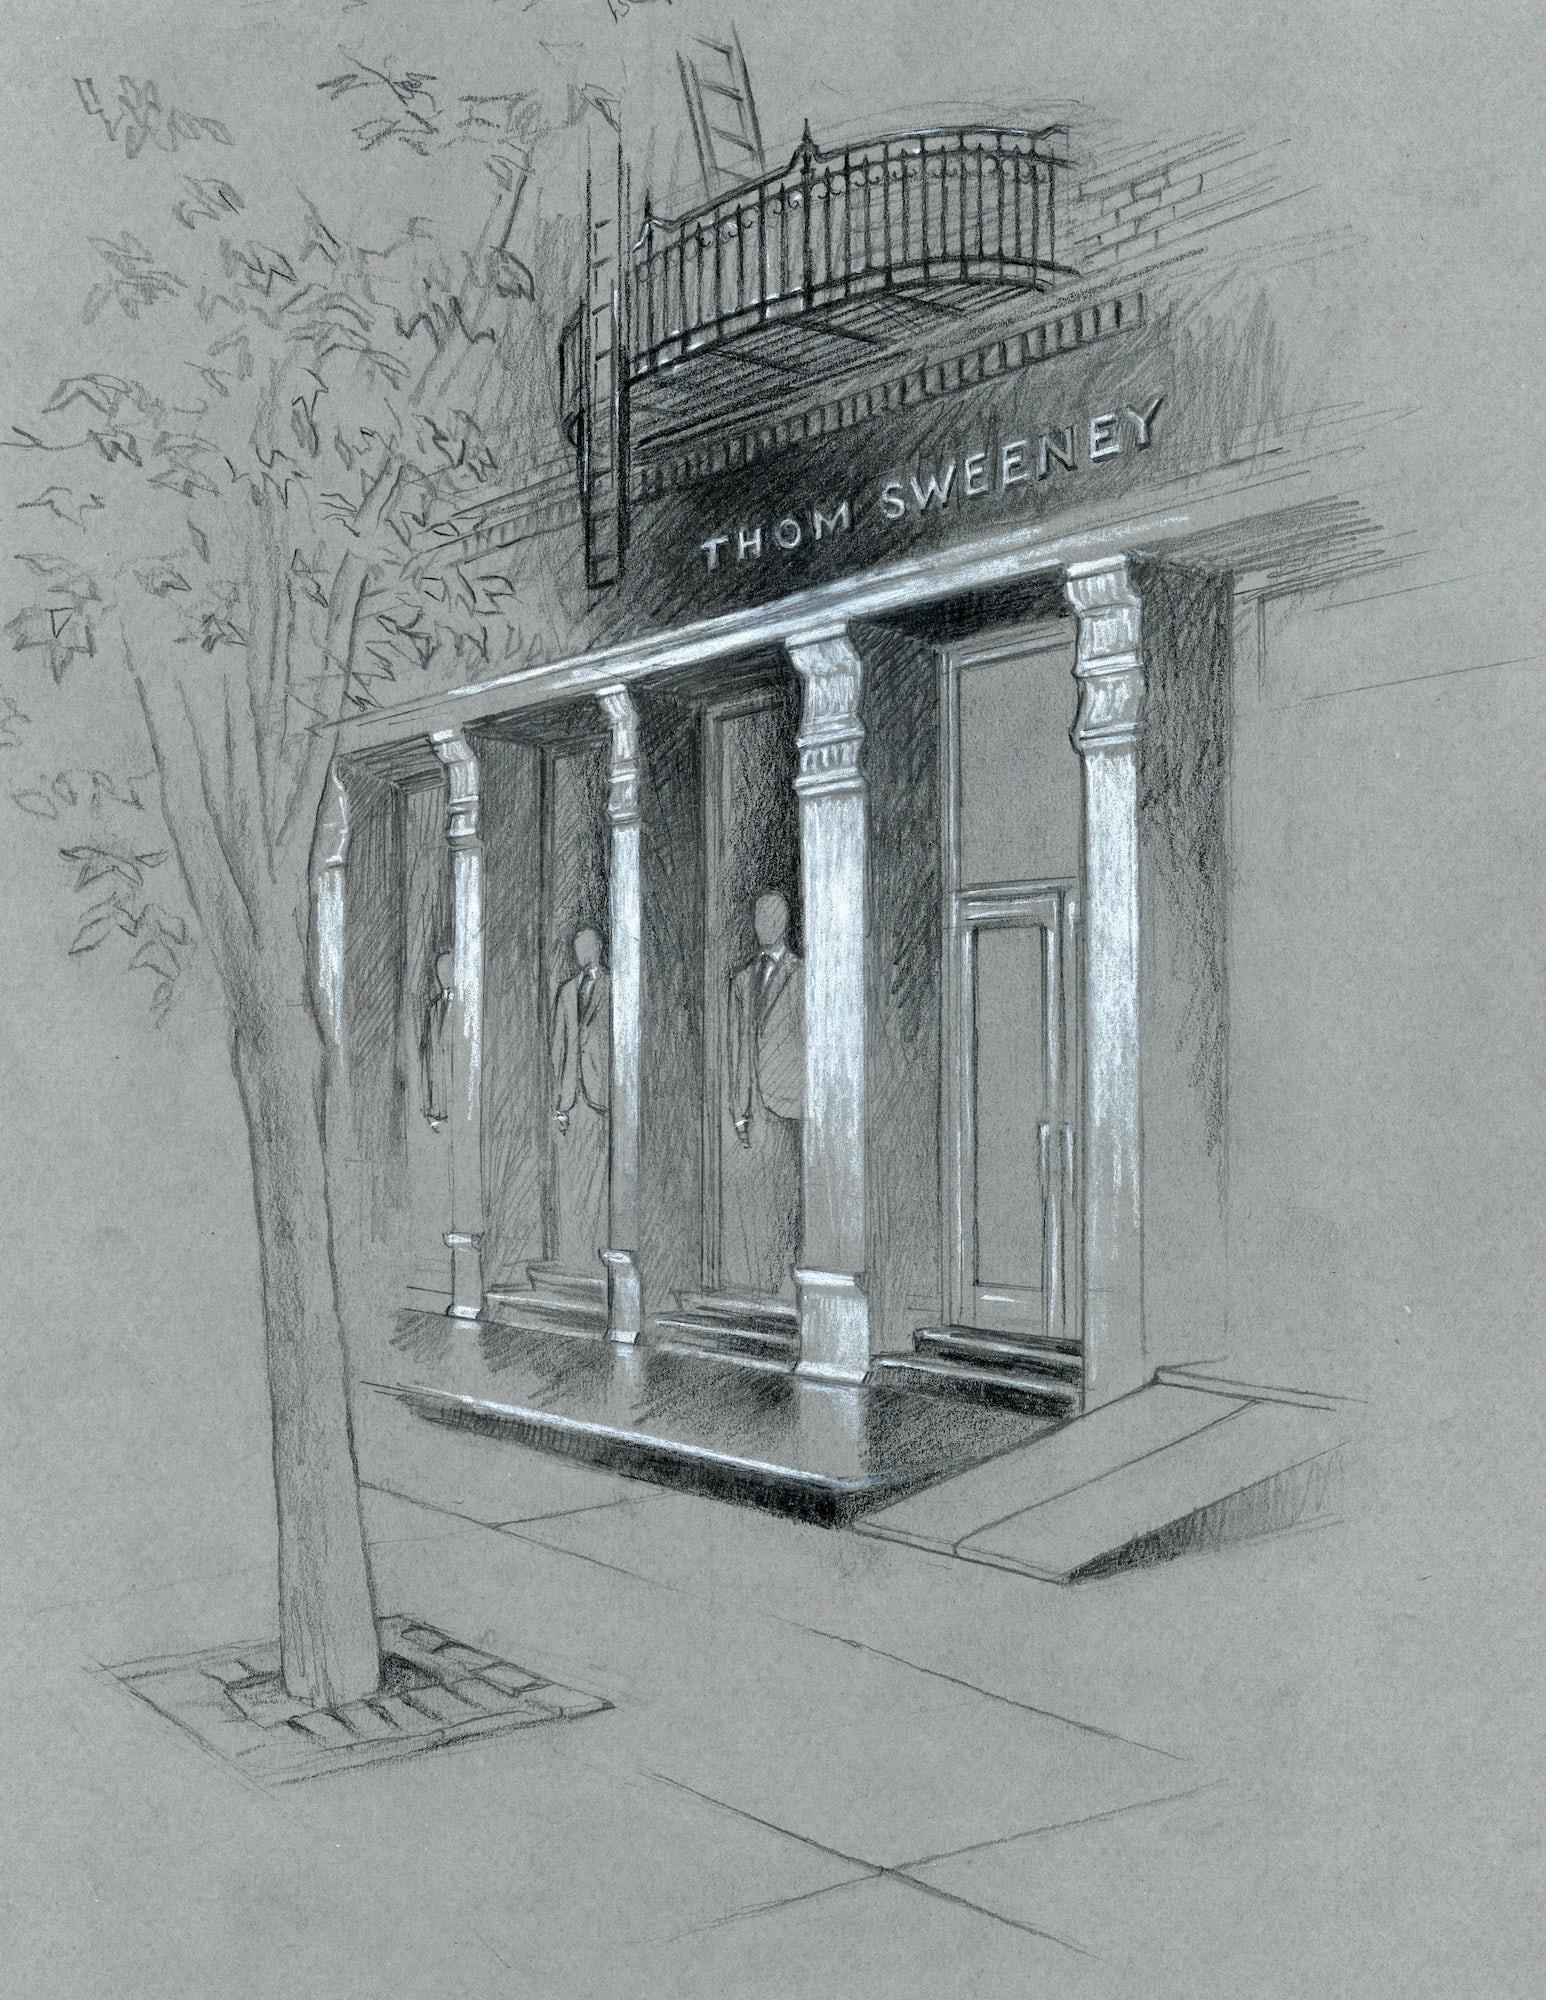 Thom Sweeney's 362 West Broadway, New York store sketch | Source: Courtesy